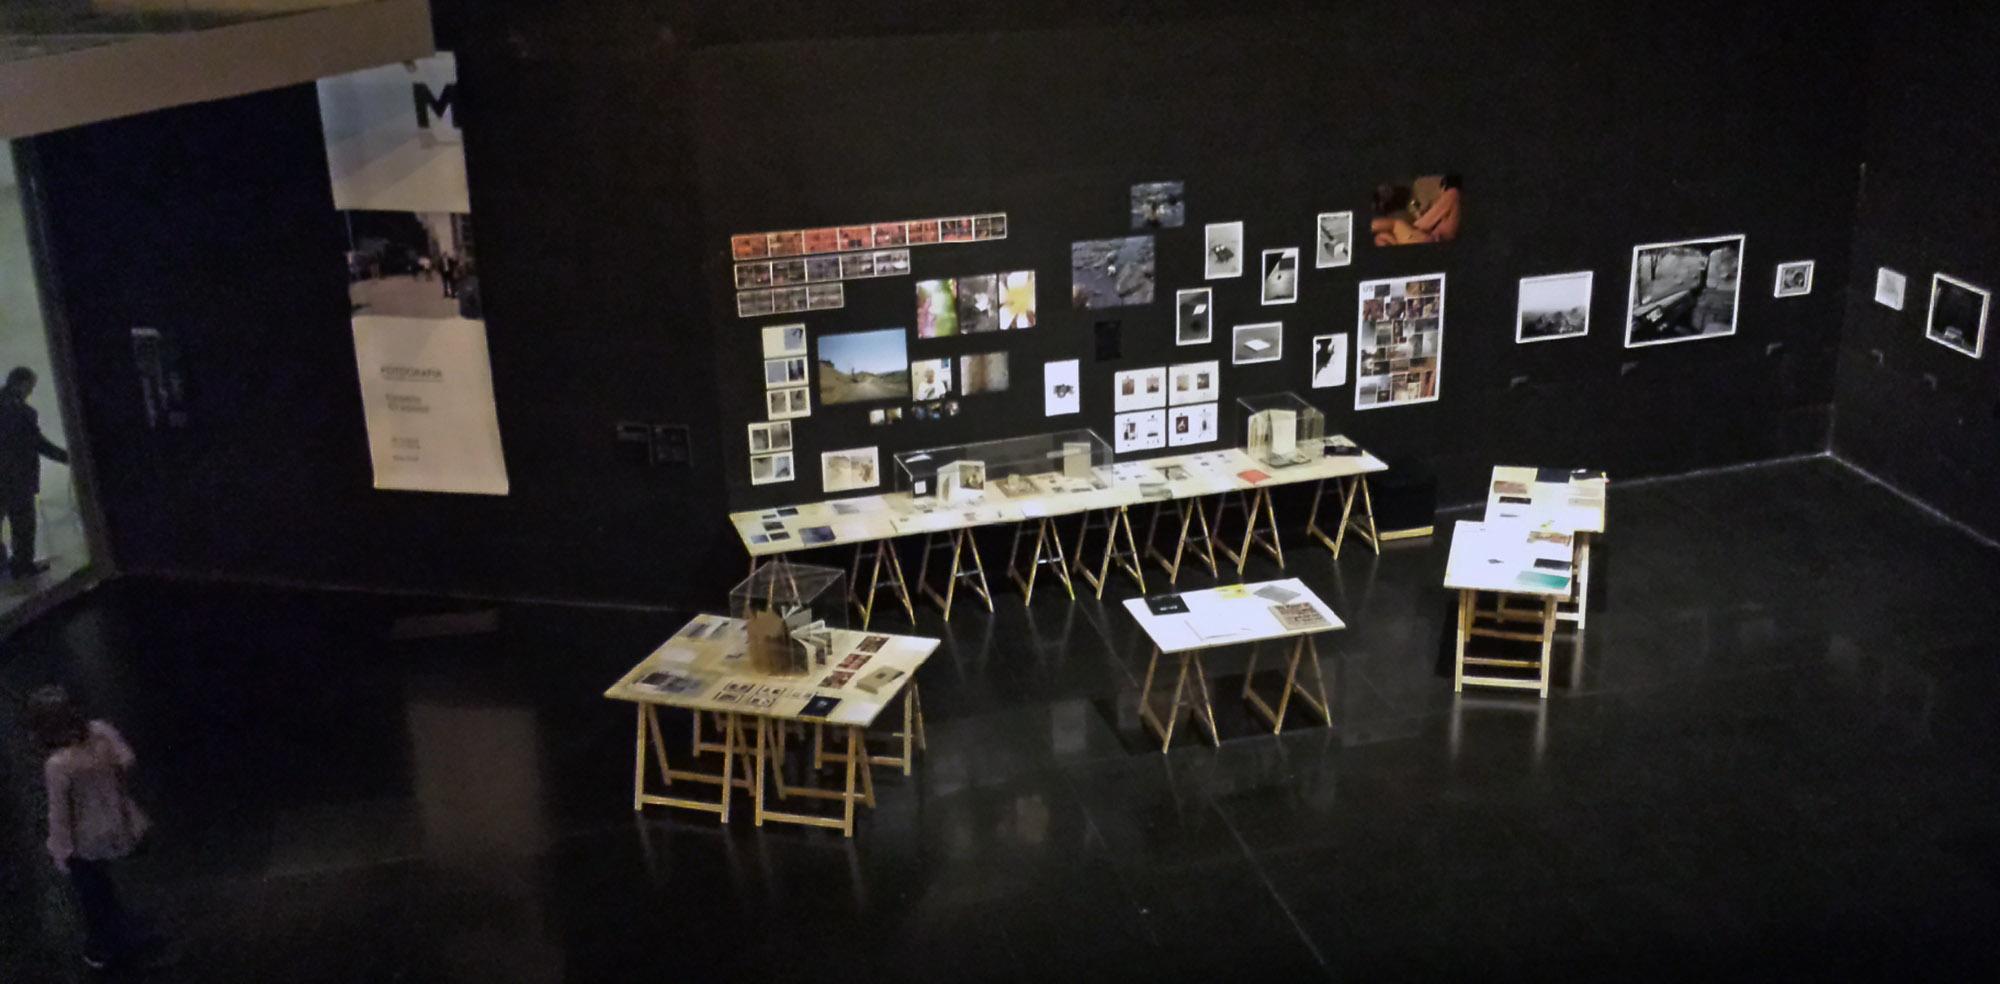 la plume_boo's space exhibition_Macro-Roma_02.jpg